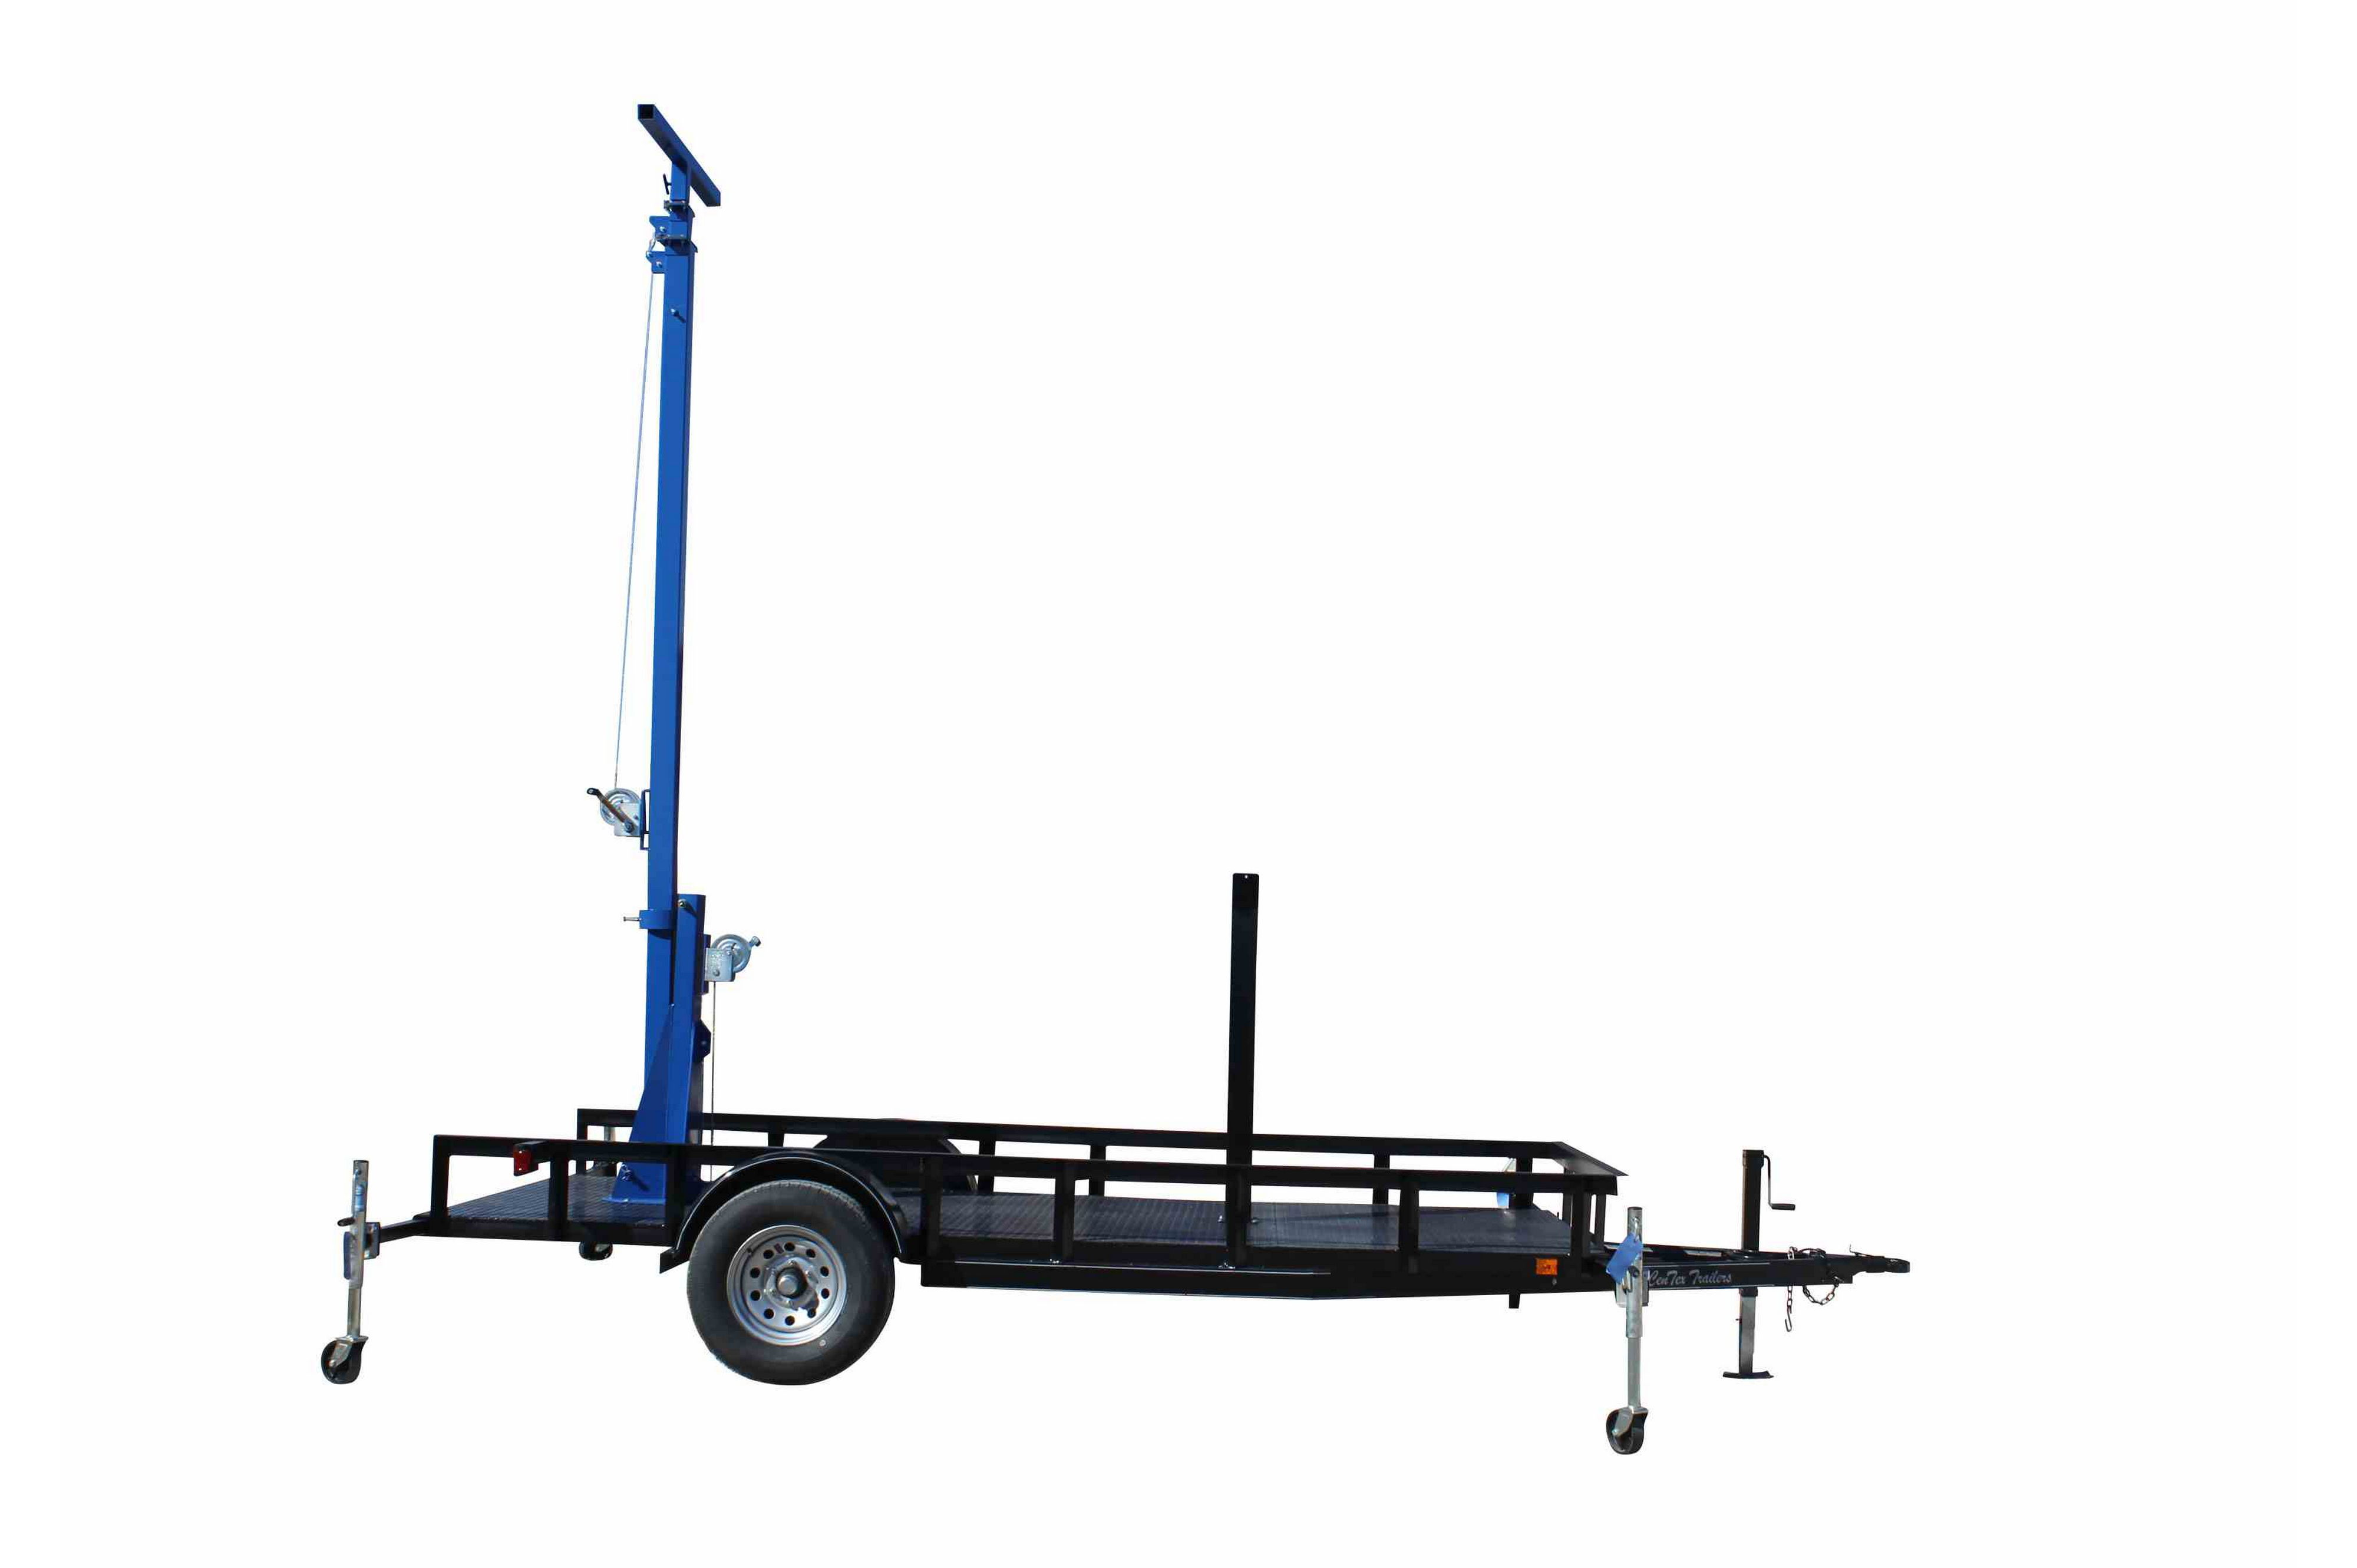 Three Stage Light Mast On 14 Foot Single Axle Trailer With